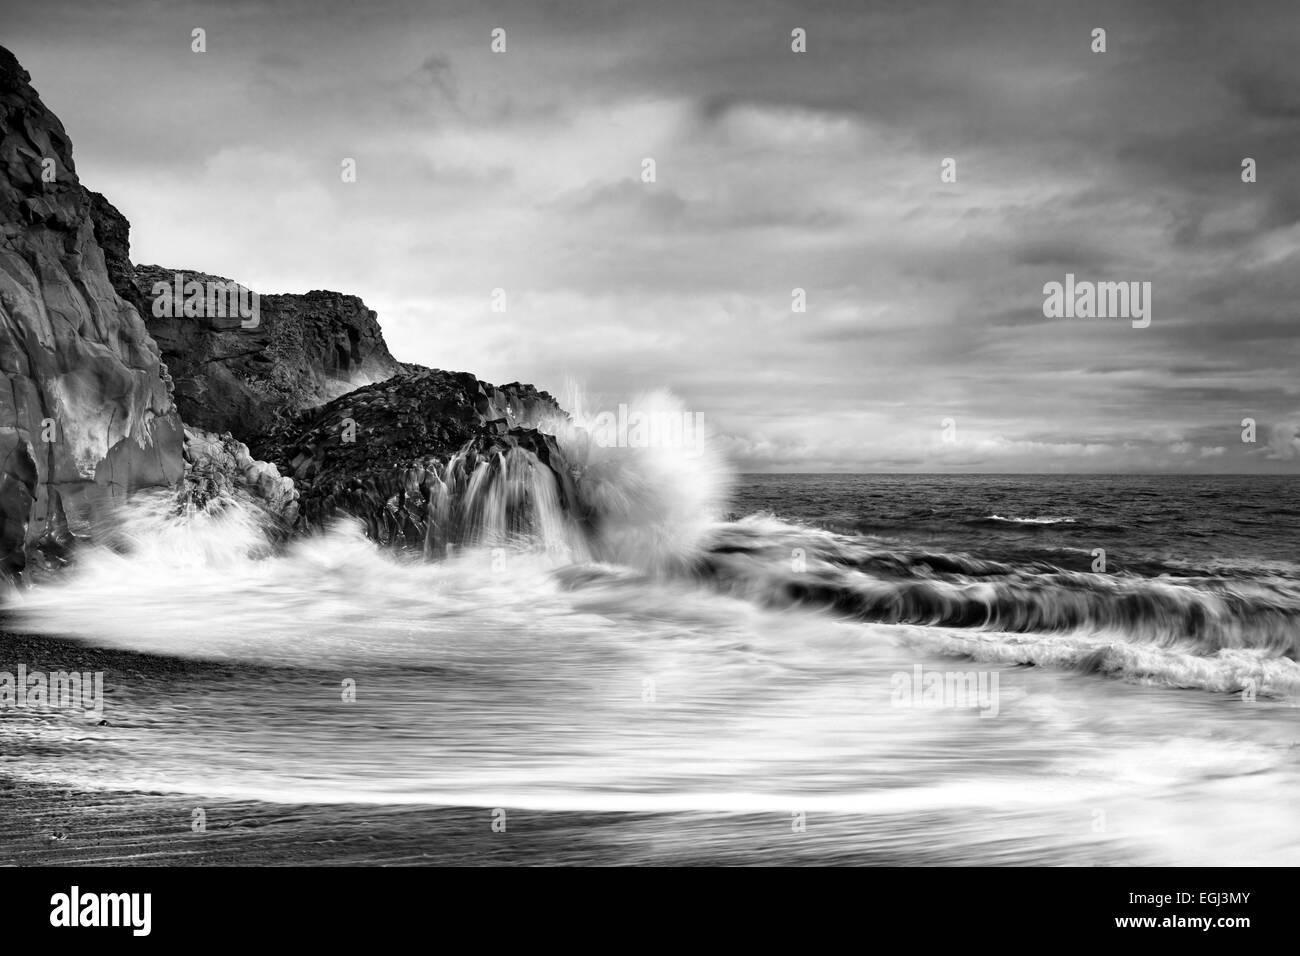 Wellen, Felsen, Atlantik, Insel, Küste, s/w Stockbild